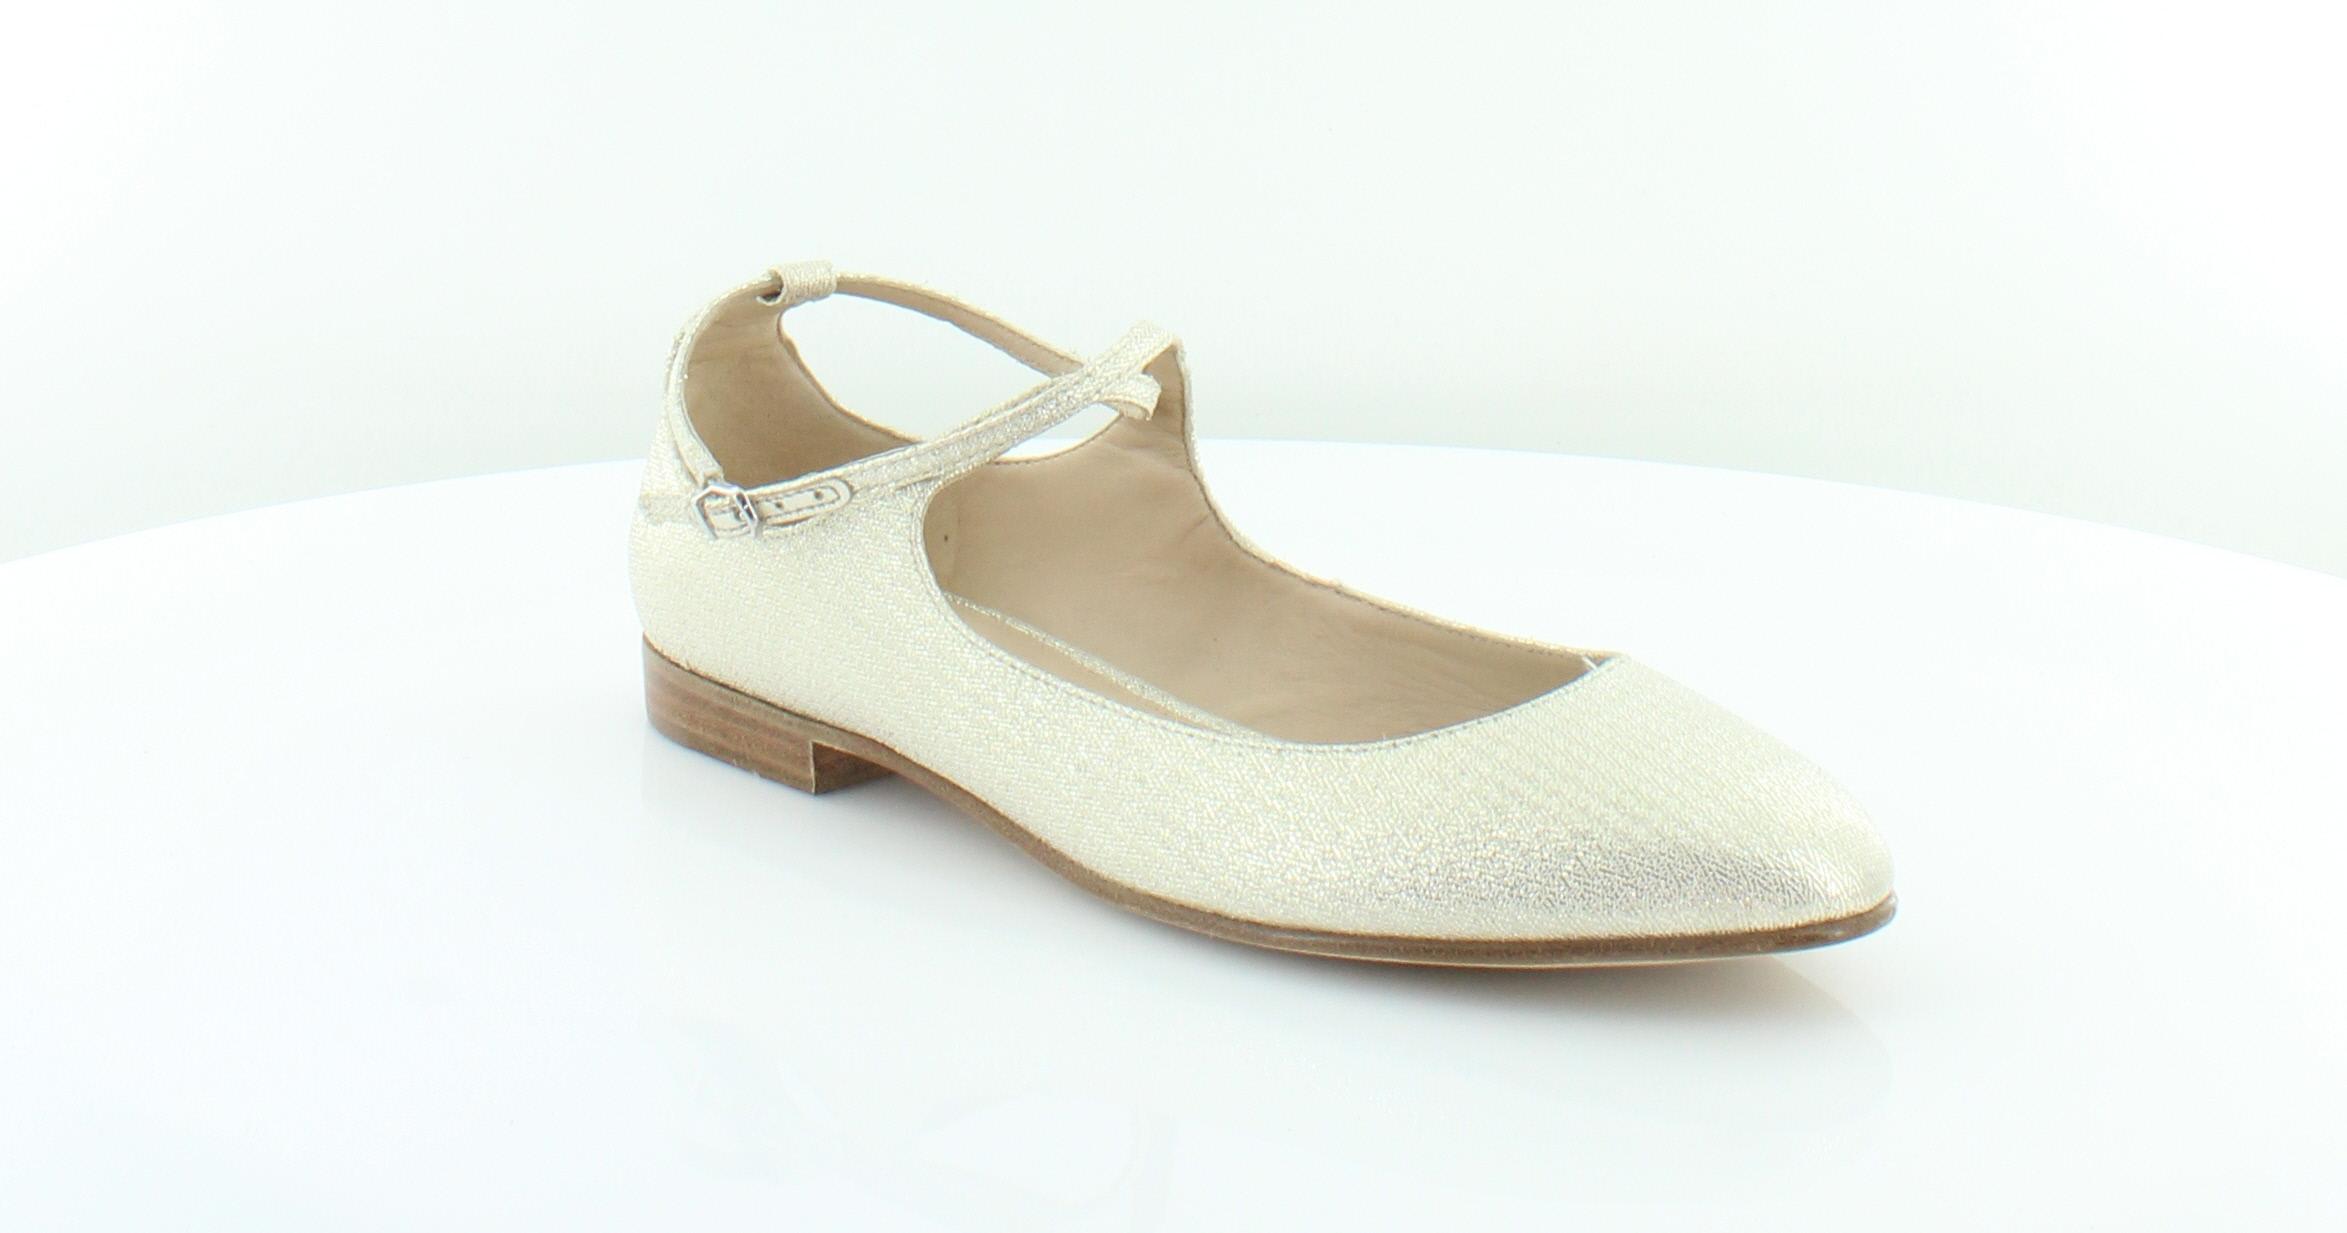 Via Spiga Yovela gold Womens shoes Size 6.5 M Flats MSRP  185